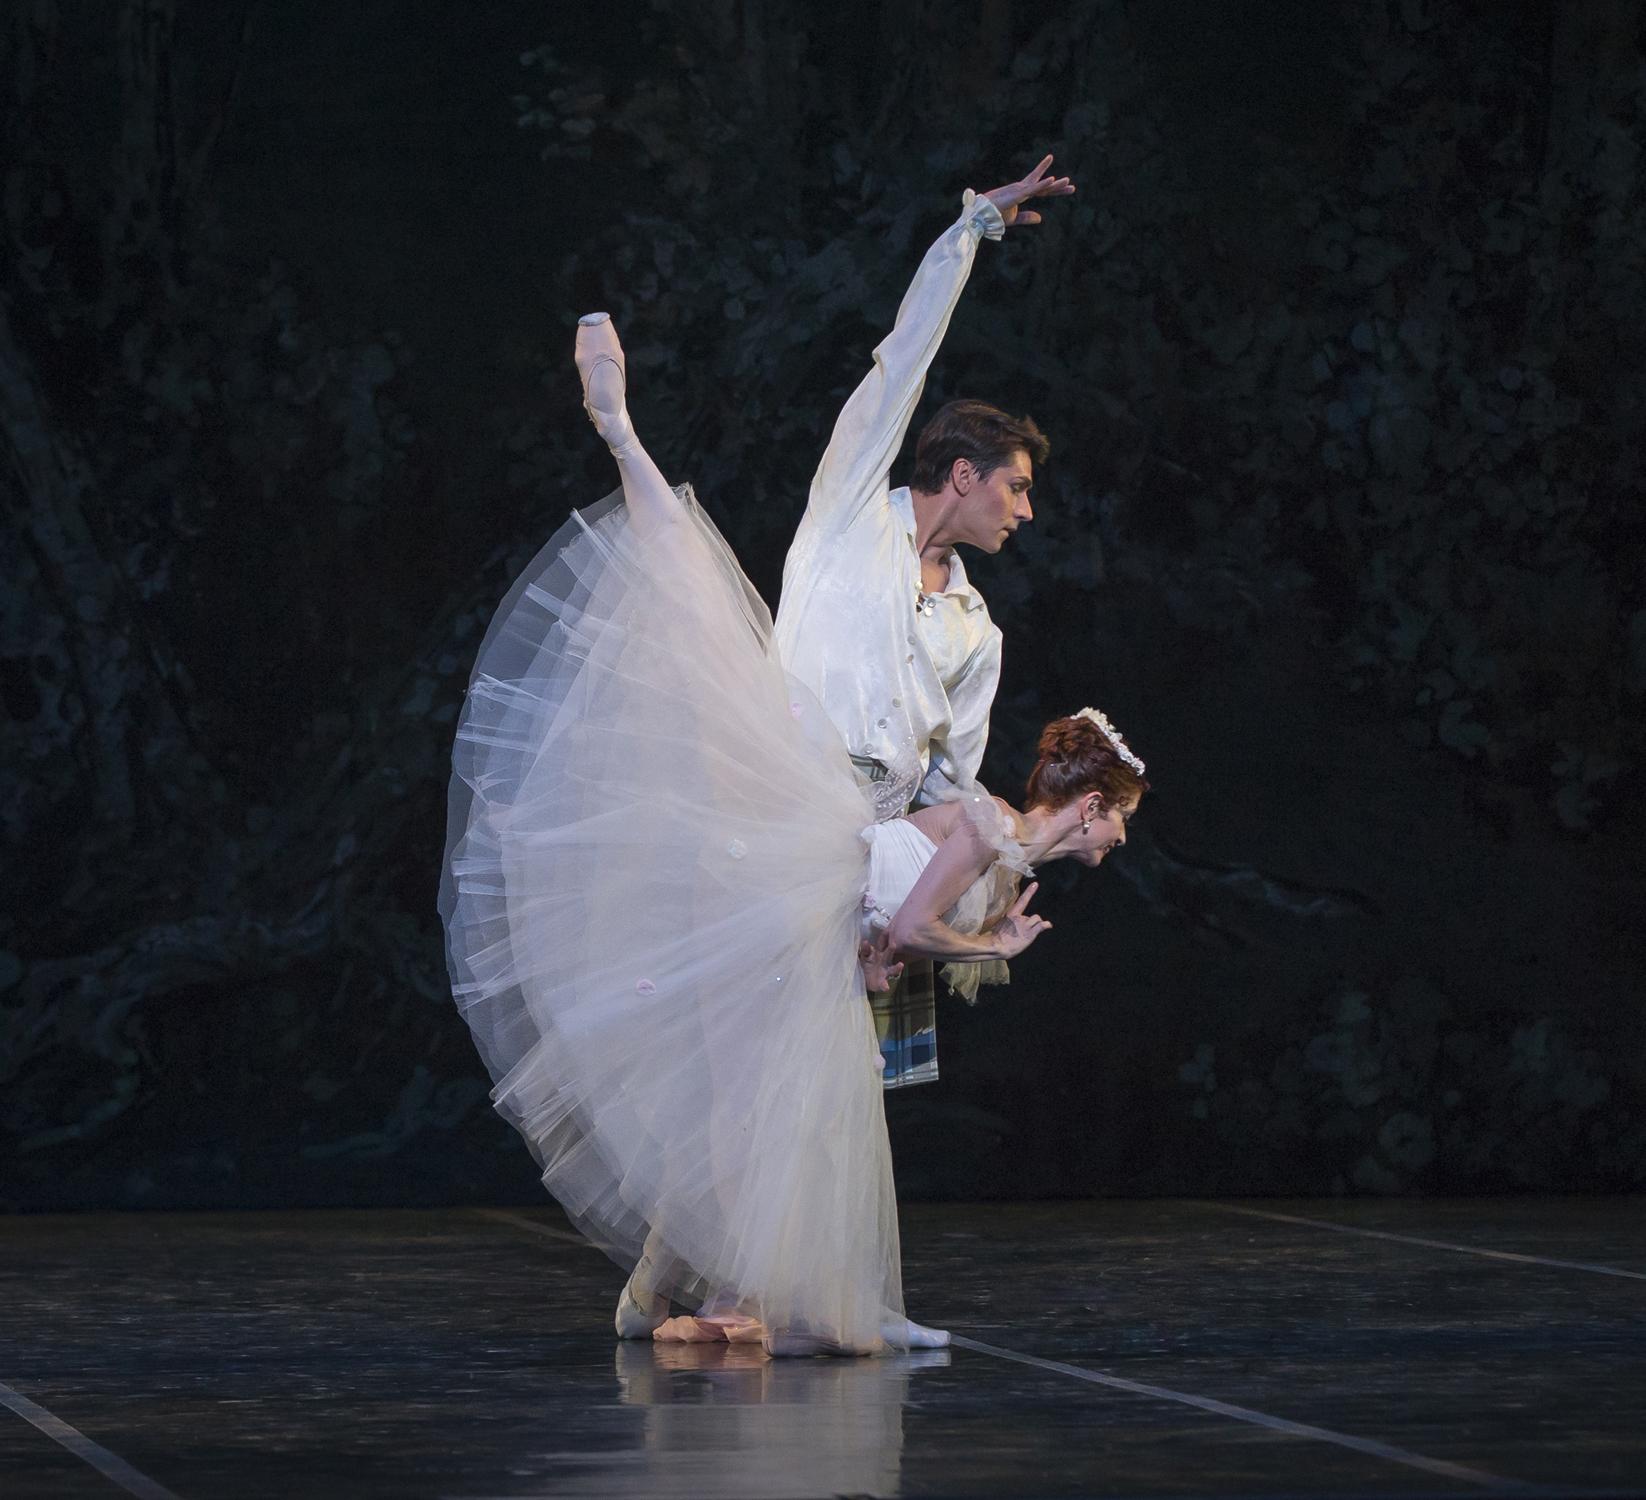 Maria-Mosina-and-Alexei-Tyukov-in-La-Sylphide-Act-II-by-Mike-Watson.jpg